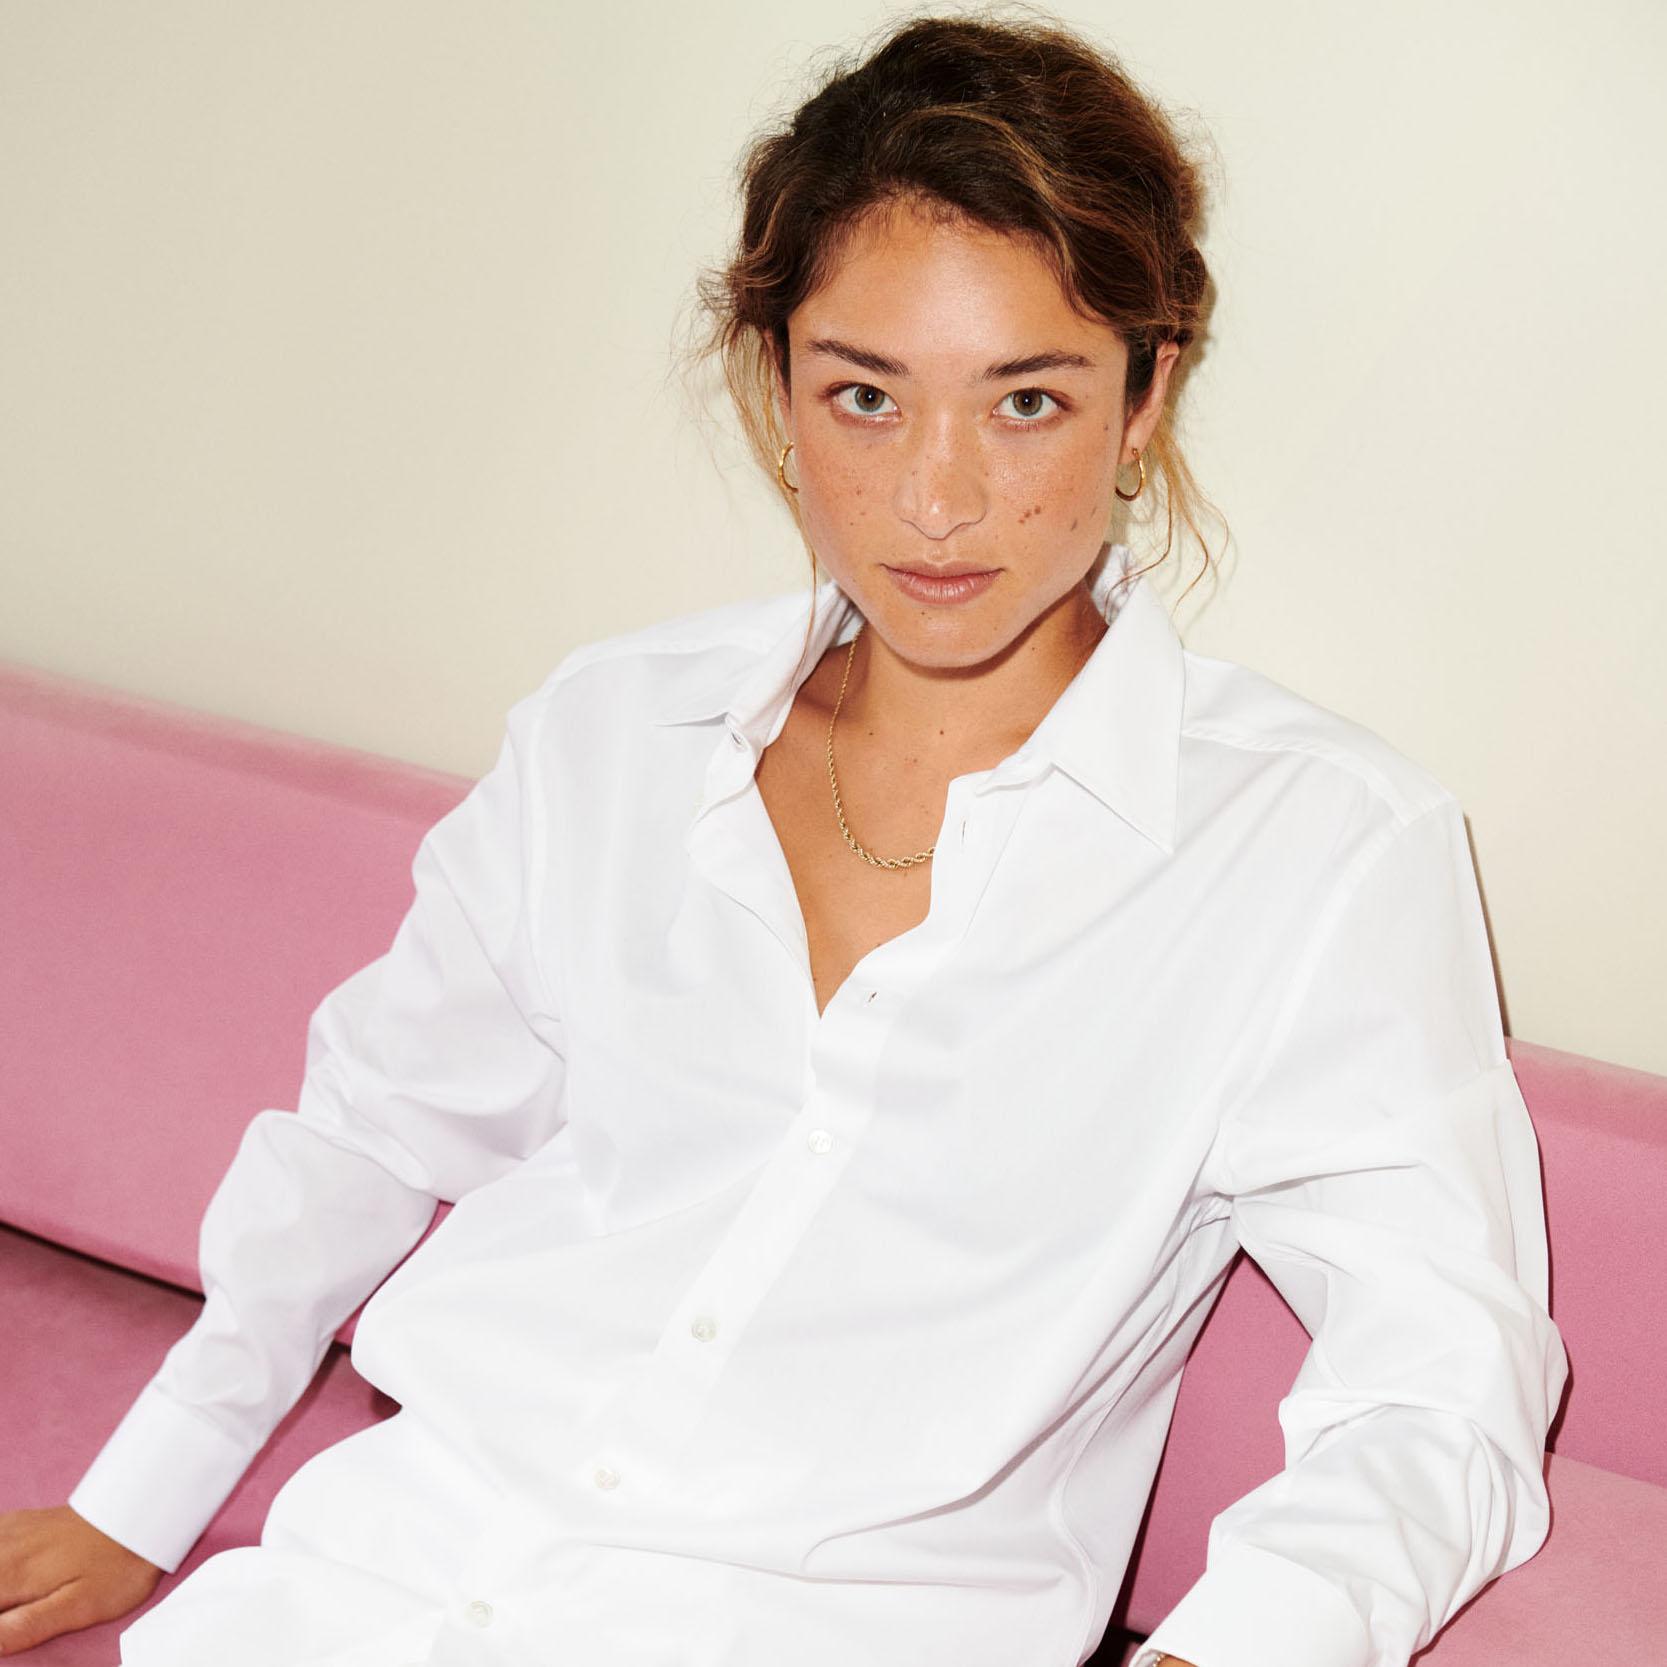 Teym - The Shirt - Women - 2